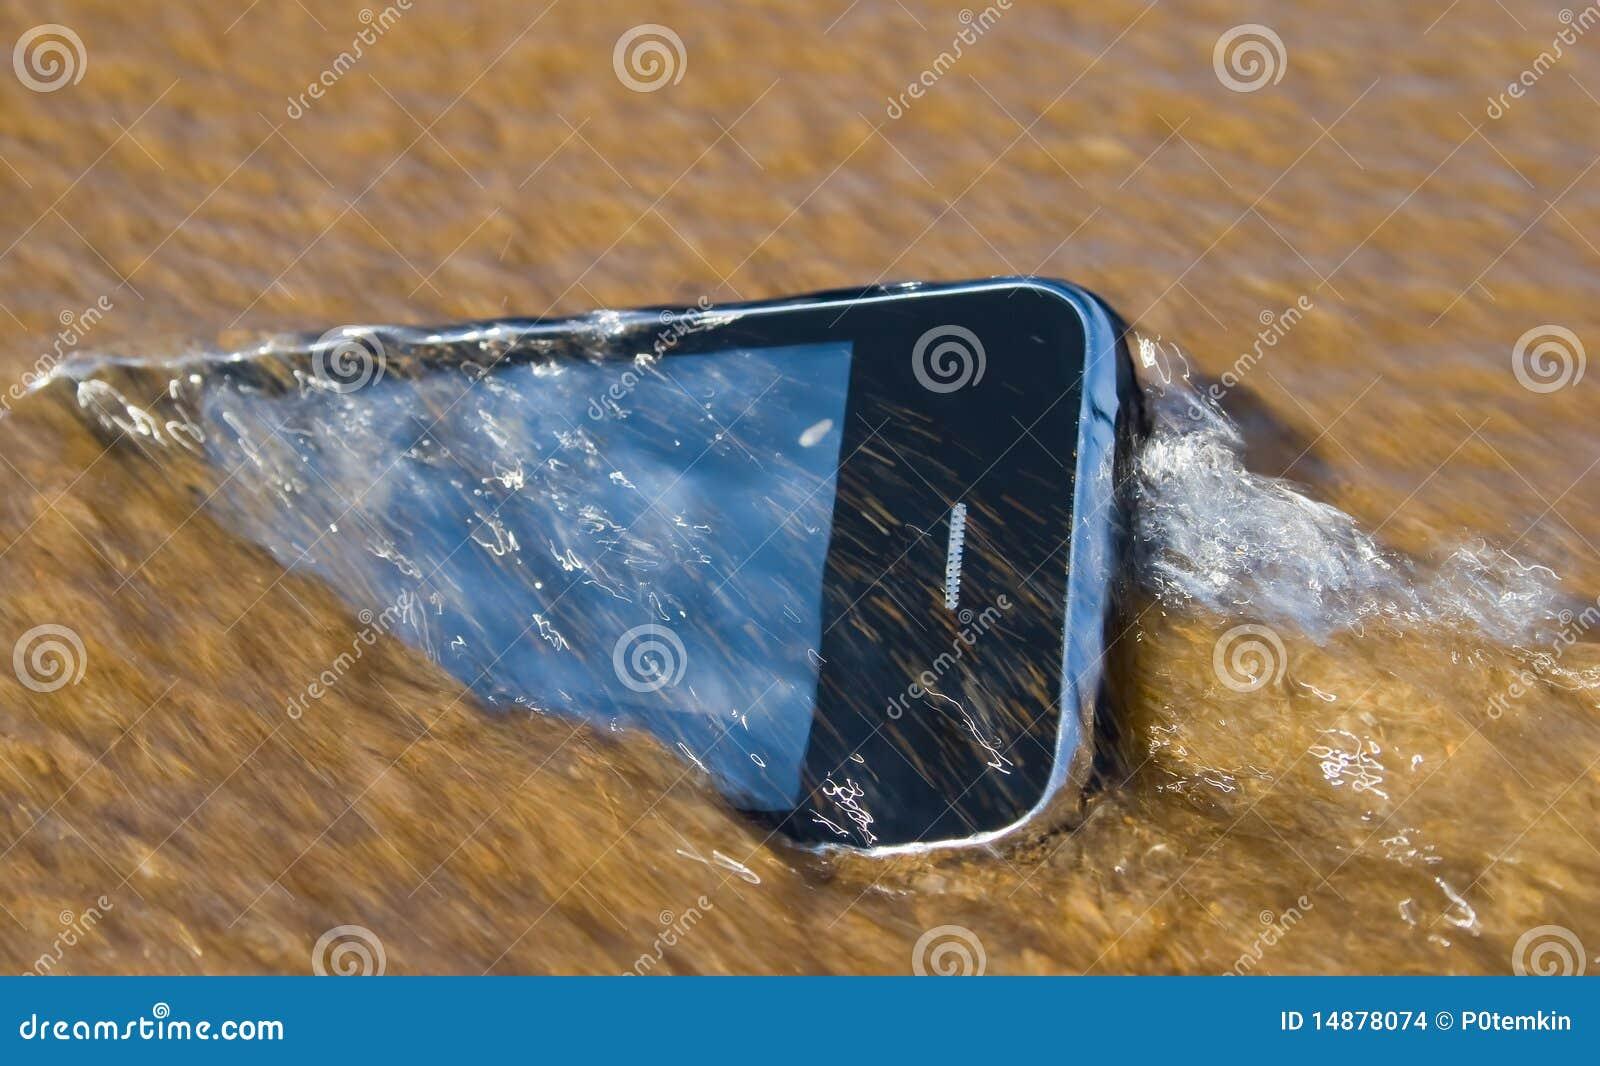 Smartphone Accidents